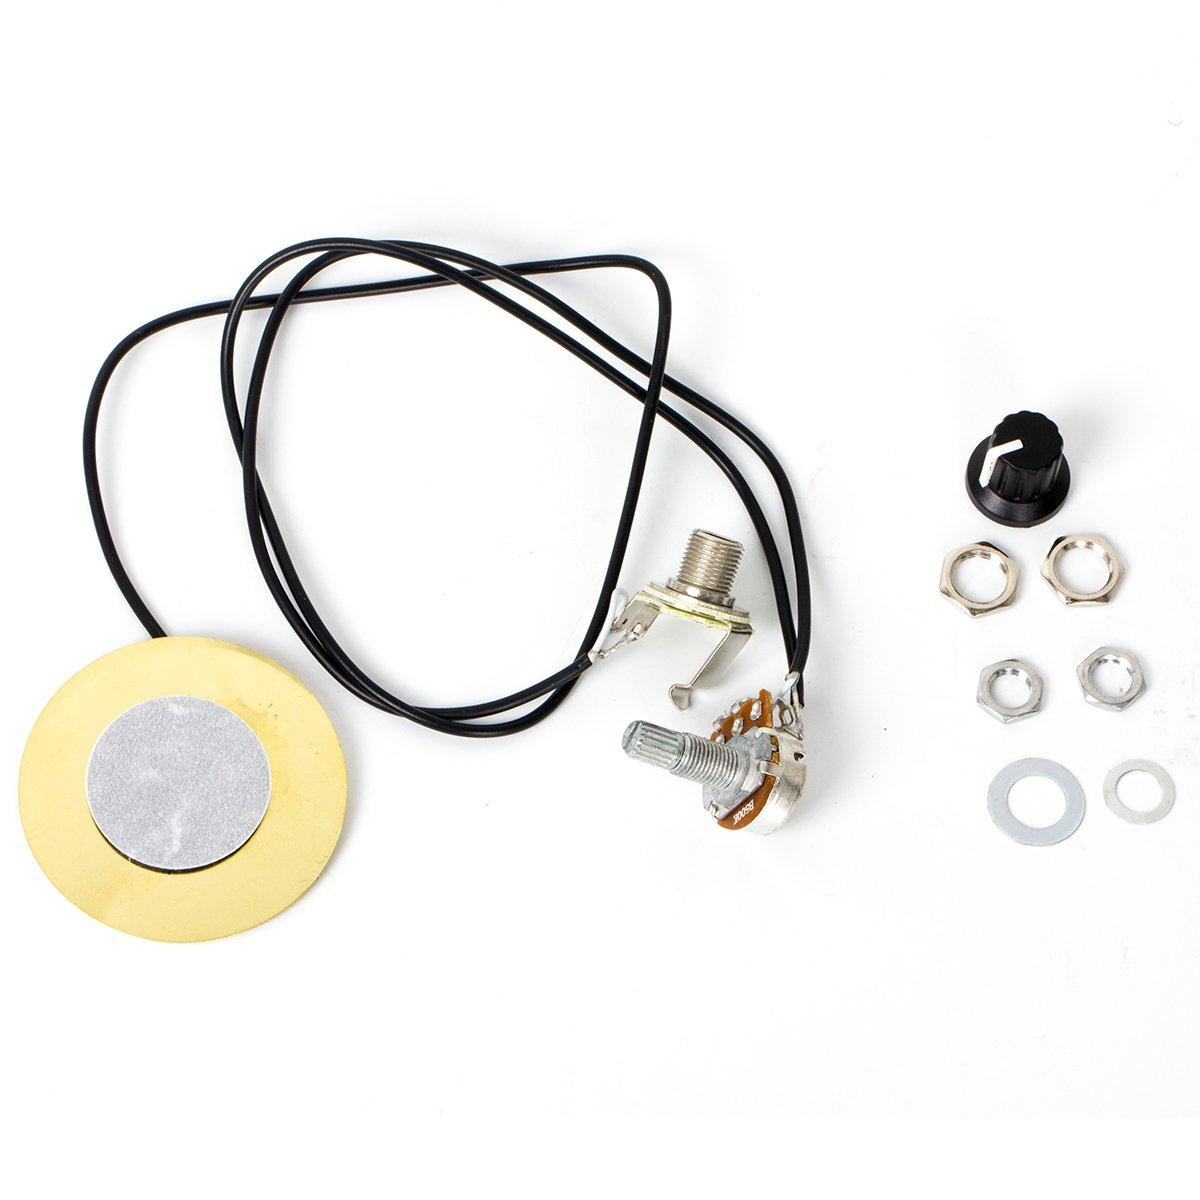 Pickup Piezo Transducer For Acoustic Guitar Violin Ukulele Mandolin Cig Box Parts Replacement 5 Pcs